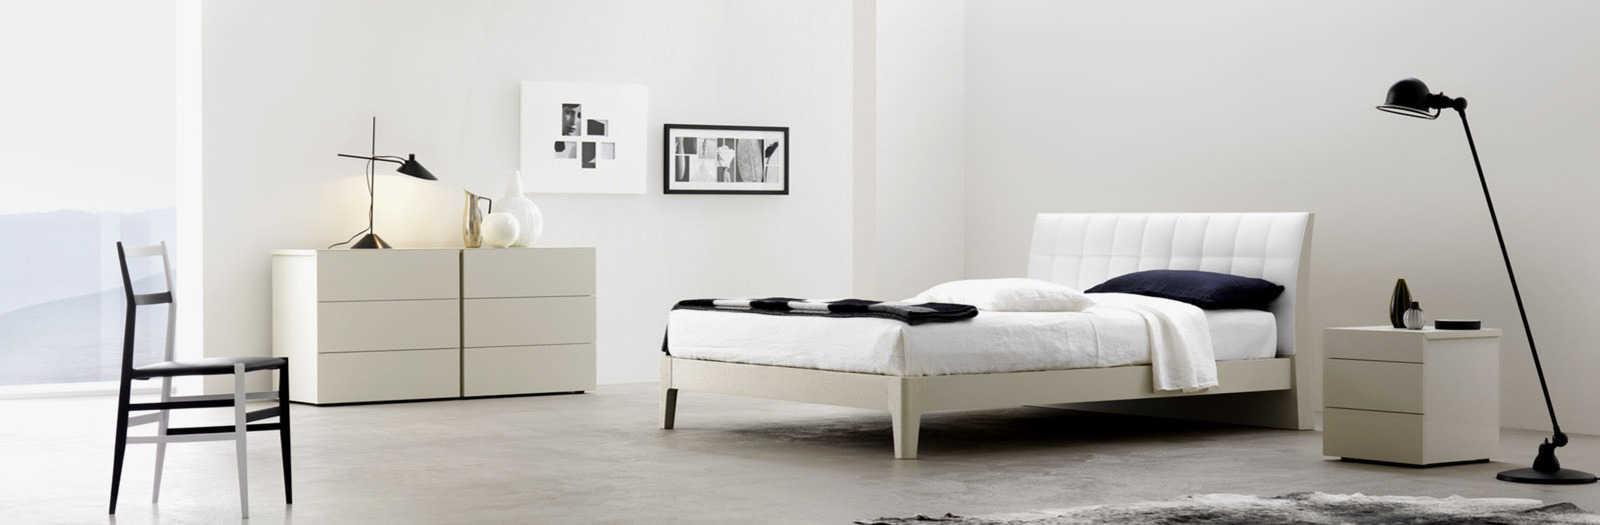 camere-stile-moderno-4